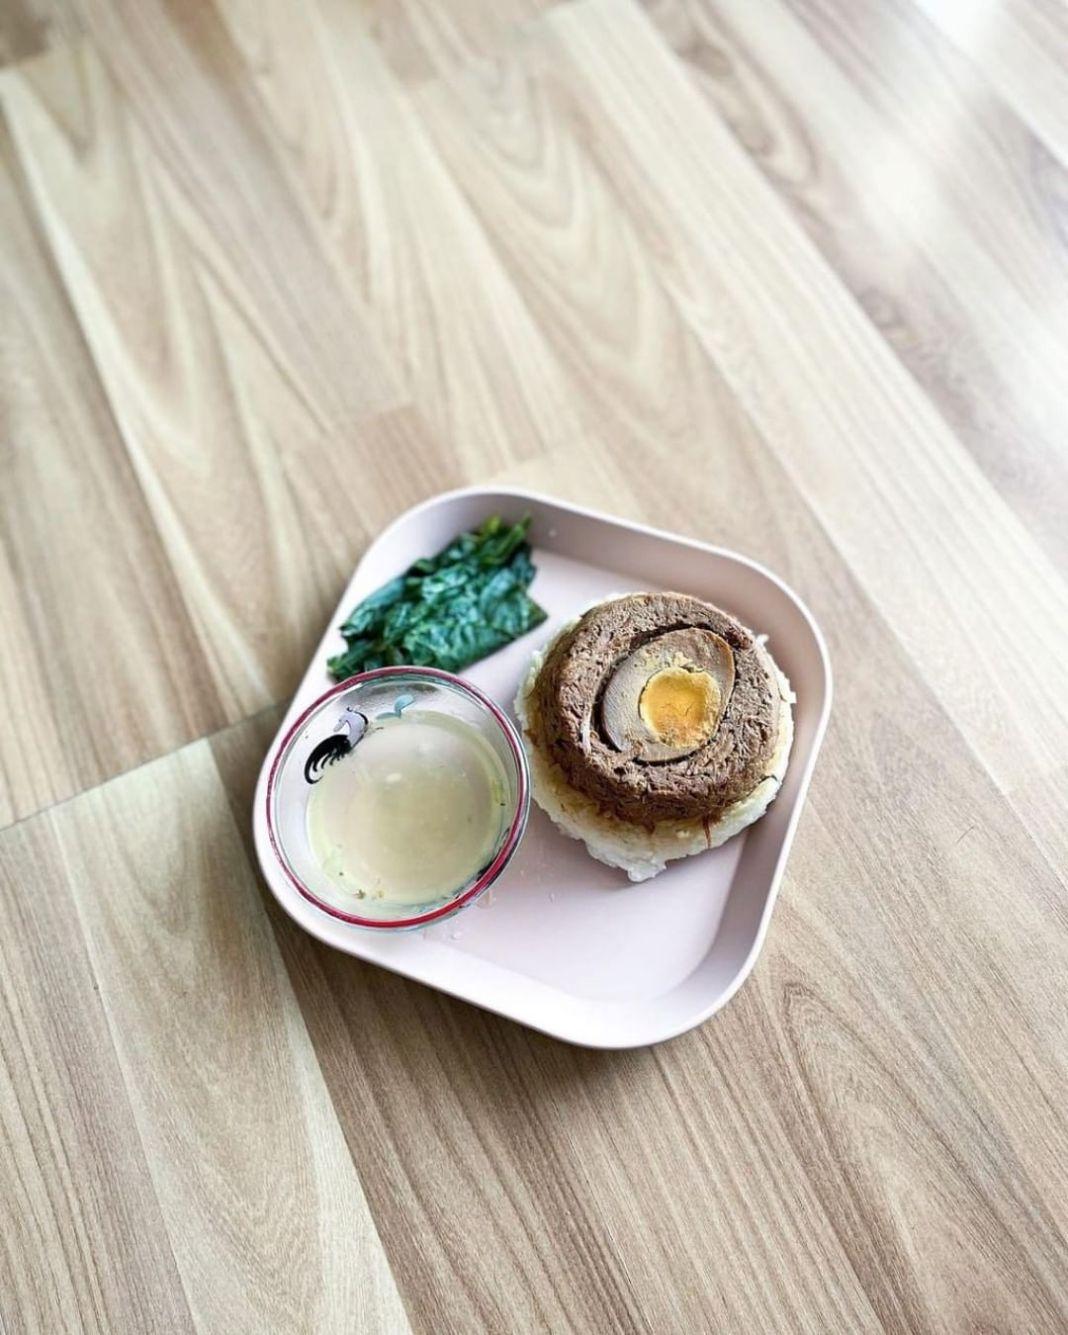 Info kuliner, Resep Nasi Tim Ayam Jamur  Bahan: (untuk 2 porsi) 100gr gr paha ayam fillet, cincang serabut  B…